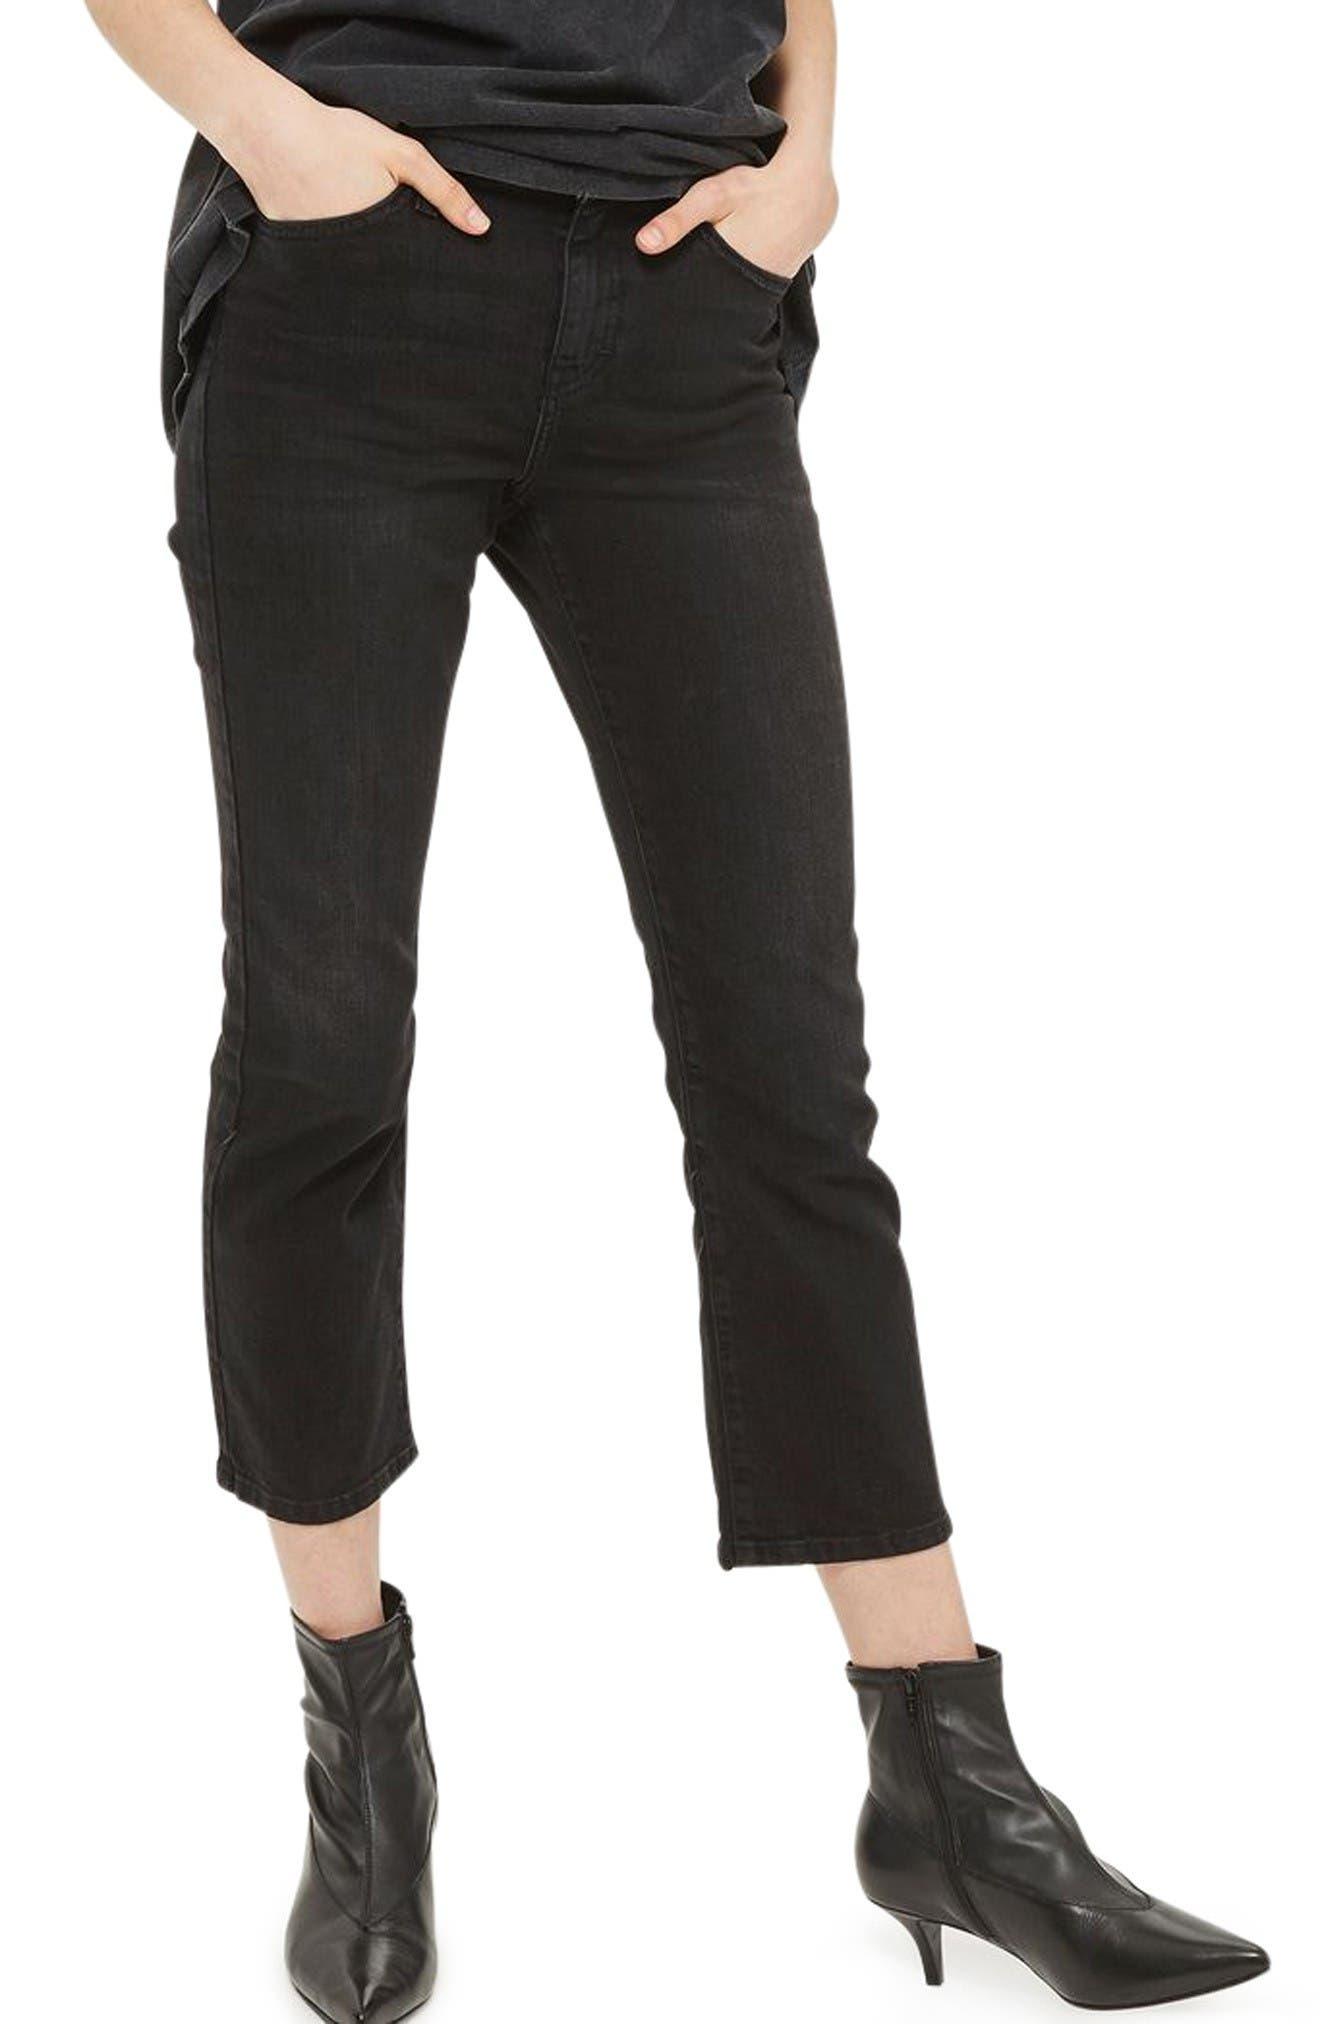 Main Image - Topshop Dree Kick Flare Jeans